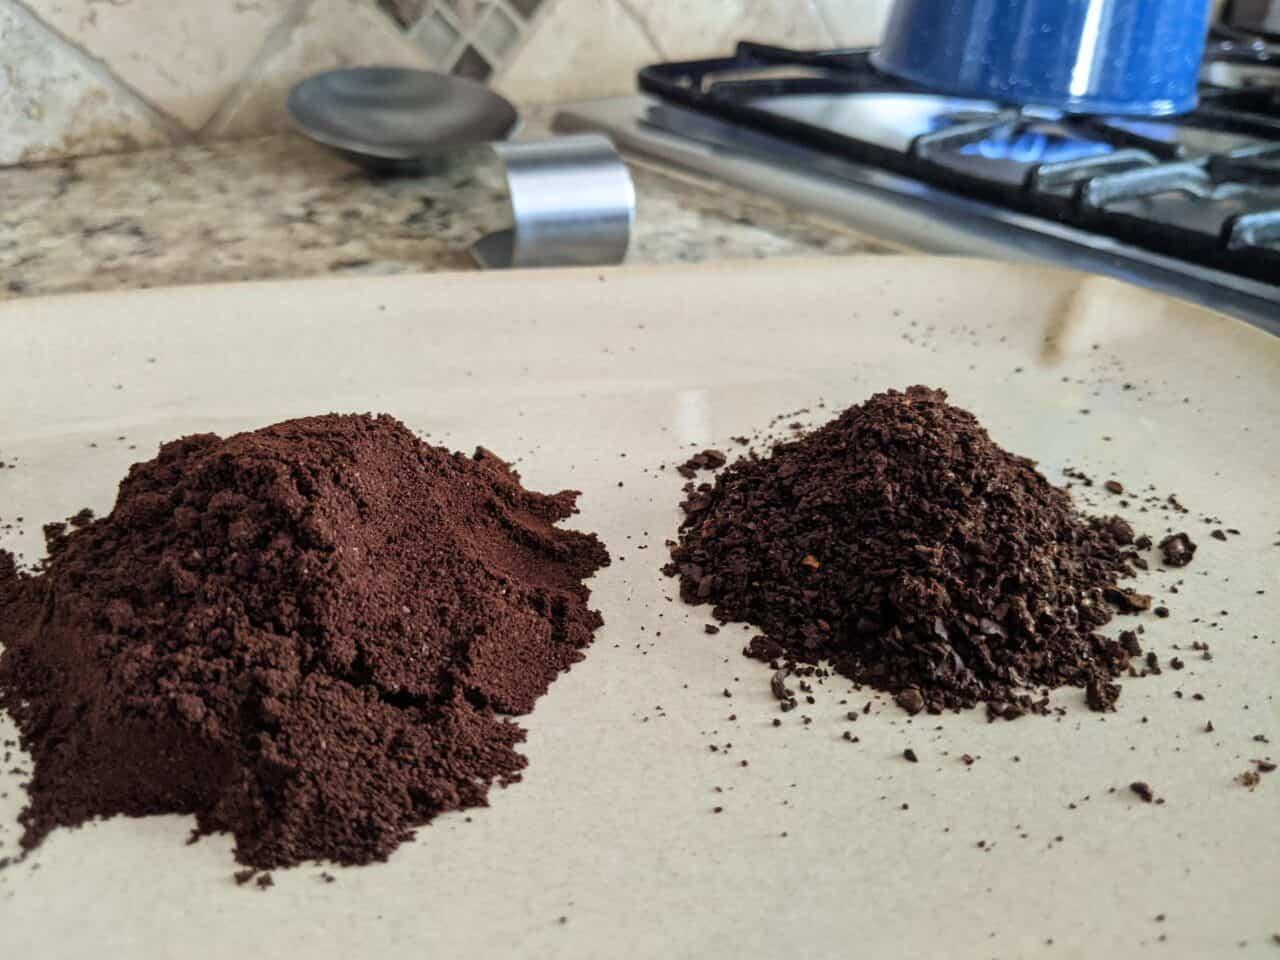 fine grind vs coarse grind coffee